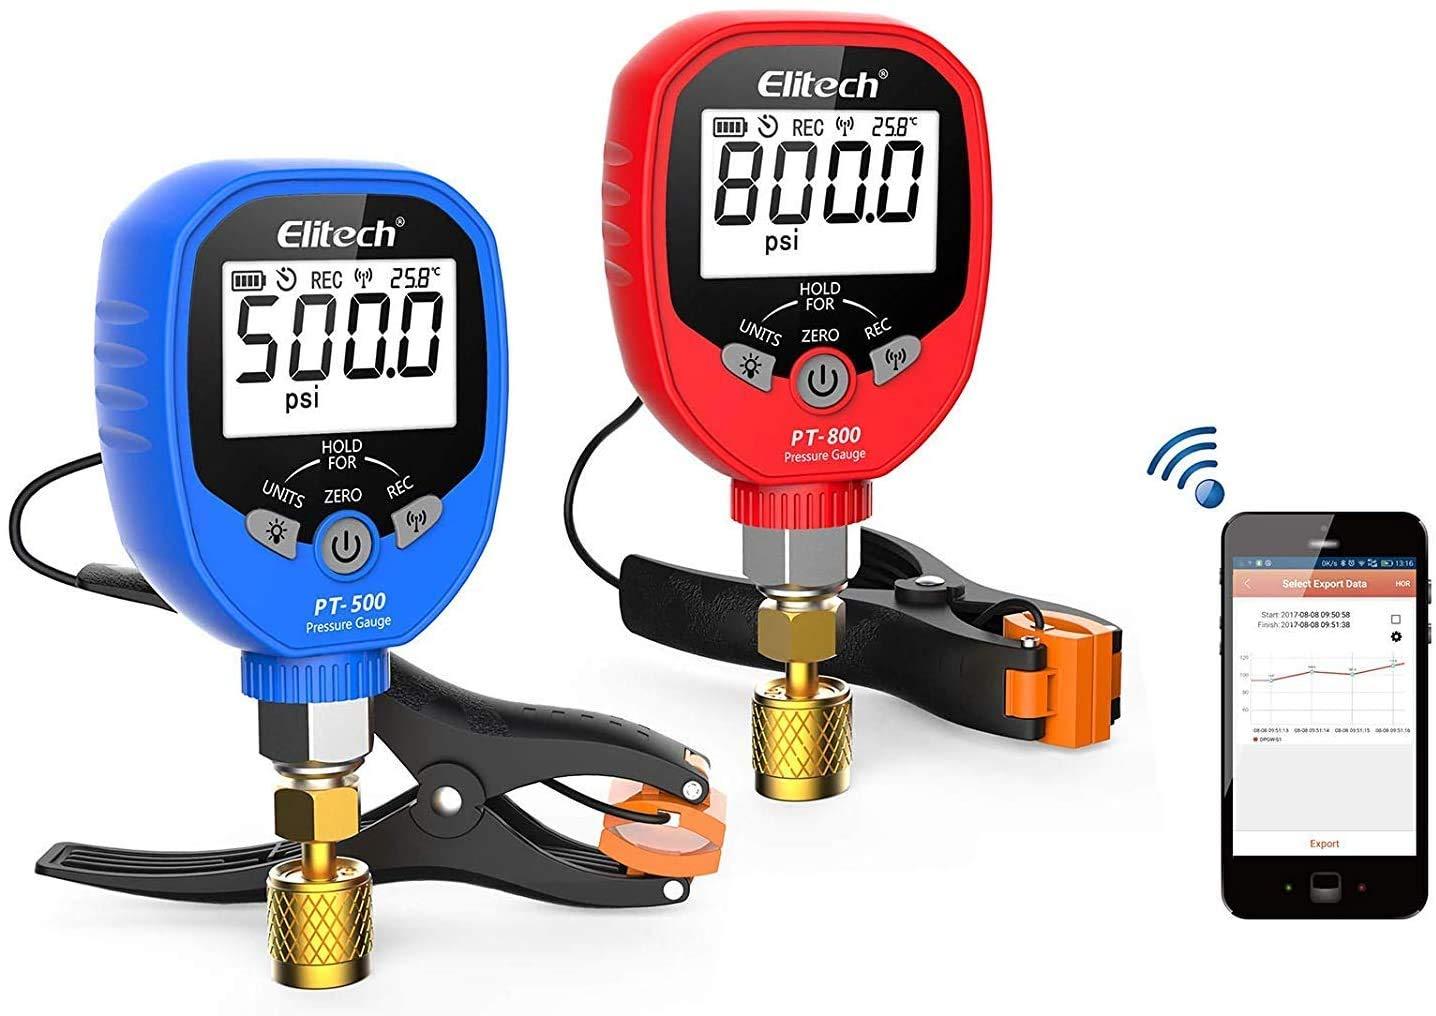 Elitech 2021 new Max 48% OFF PT-500PT-800 Wireless Refrigeration Ga Digital Manifold